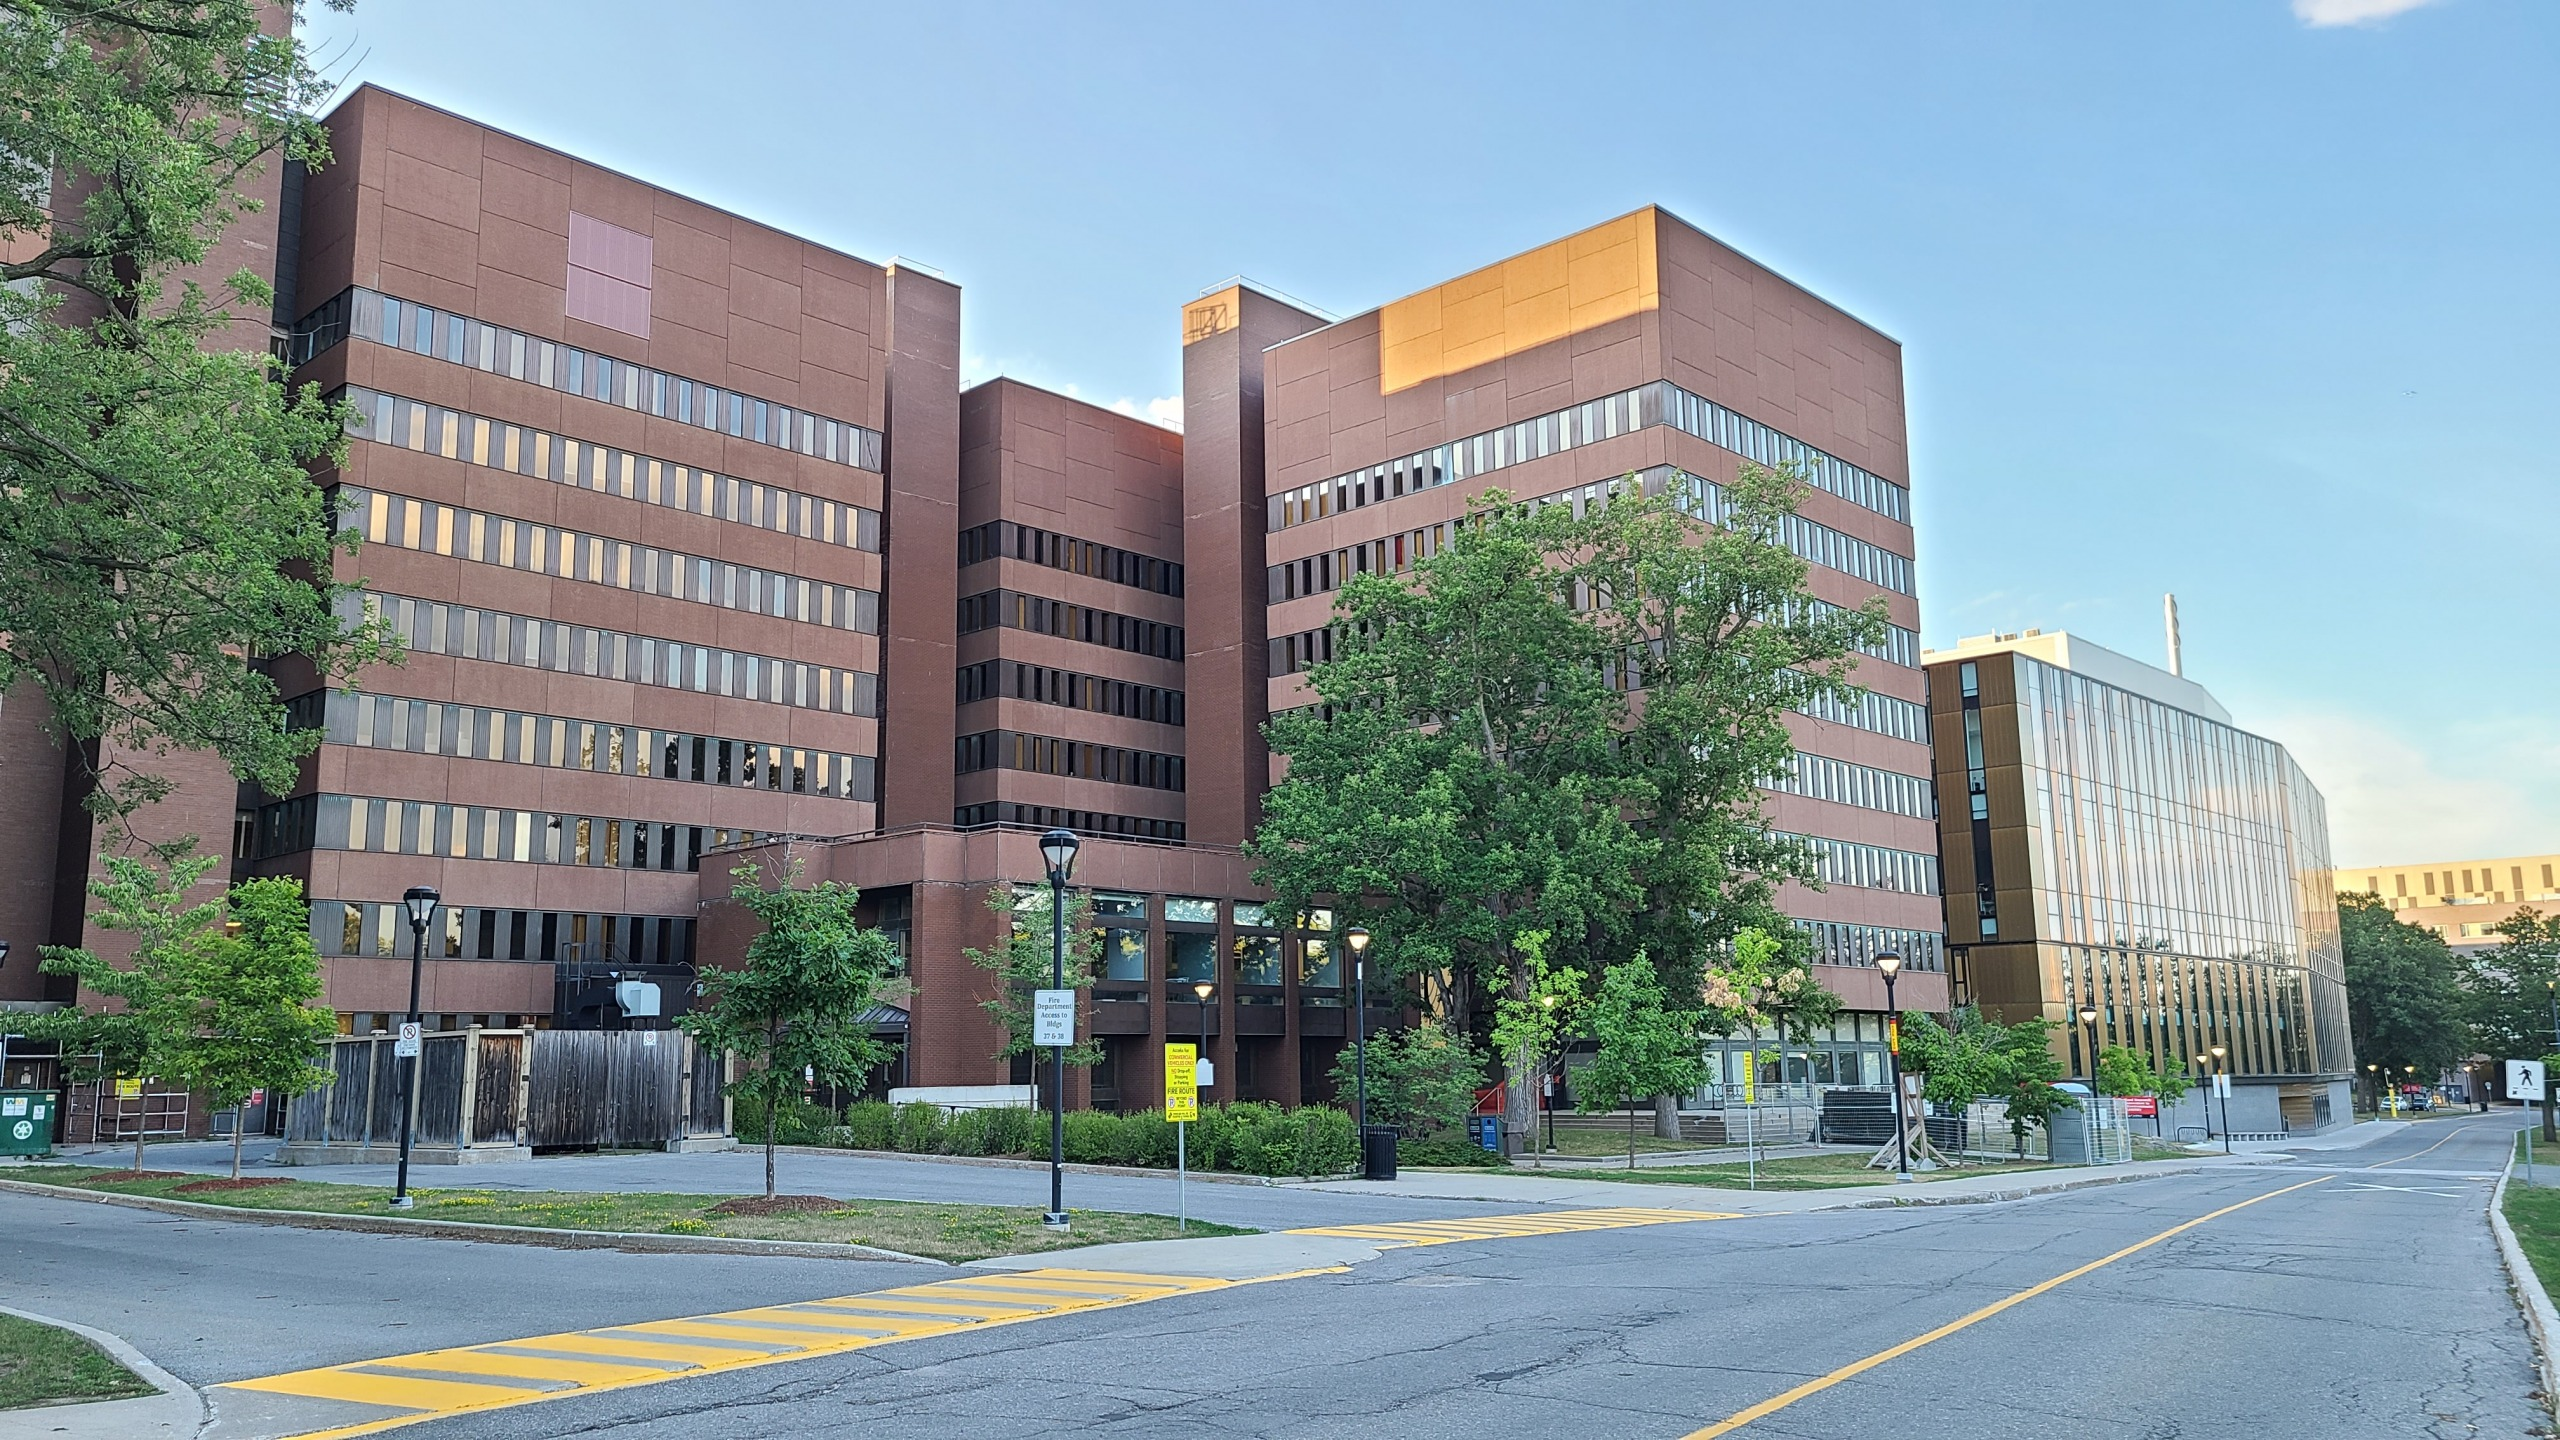 Carleton University - Architecture Schools in Canada